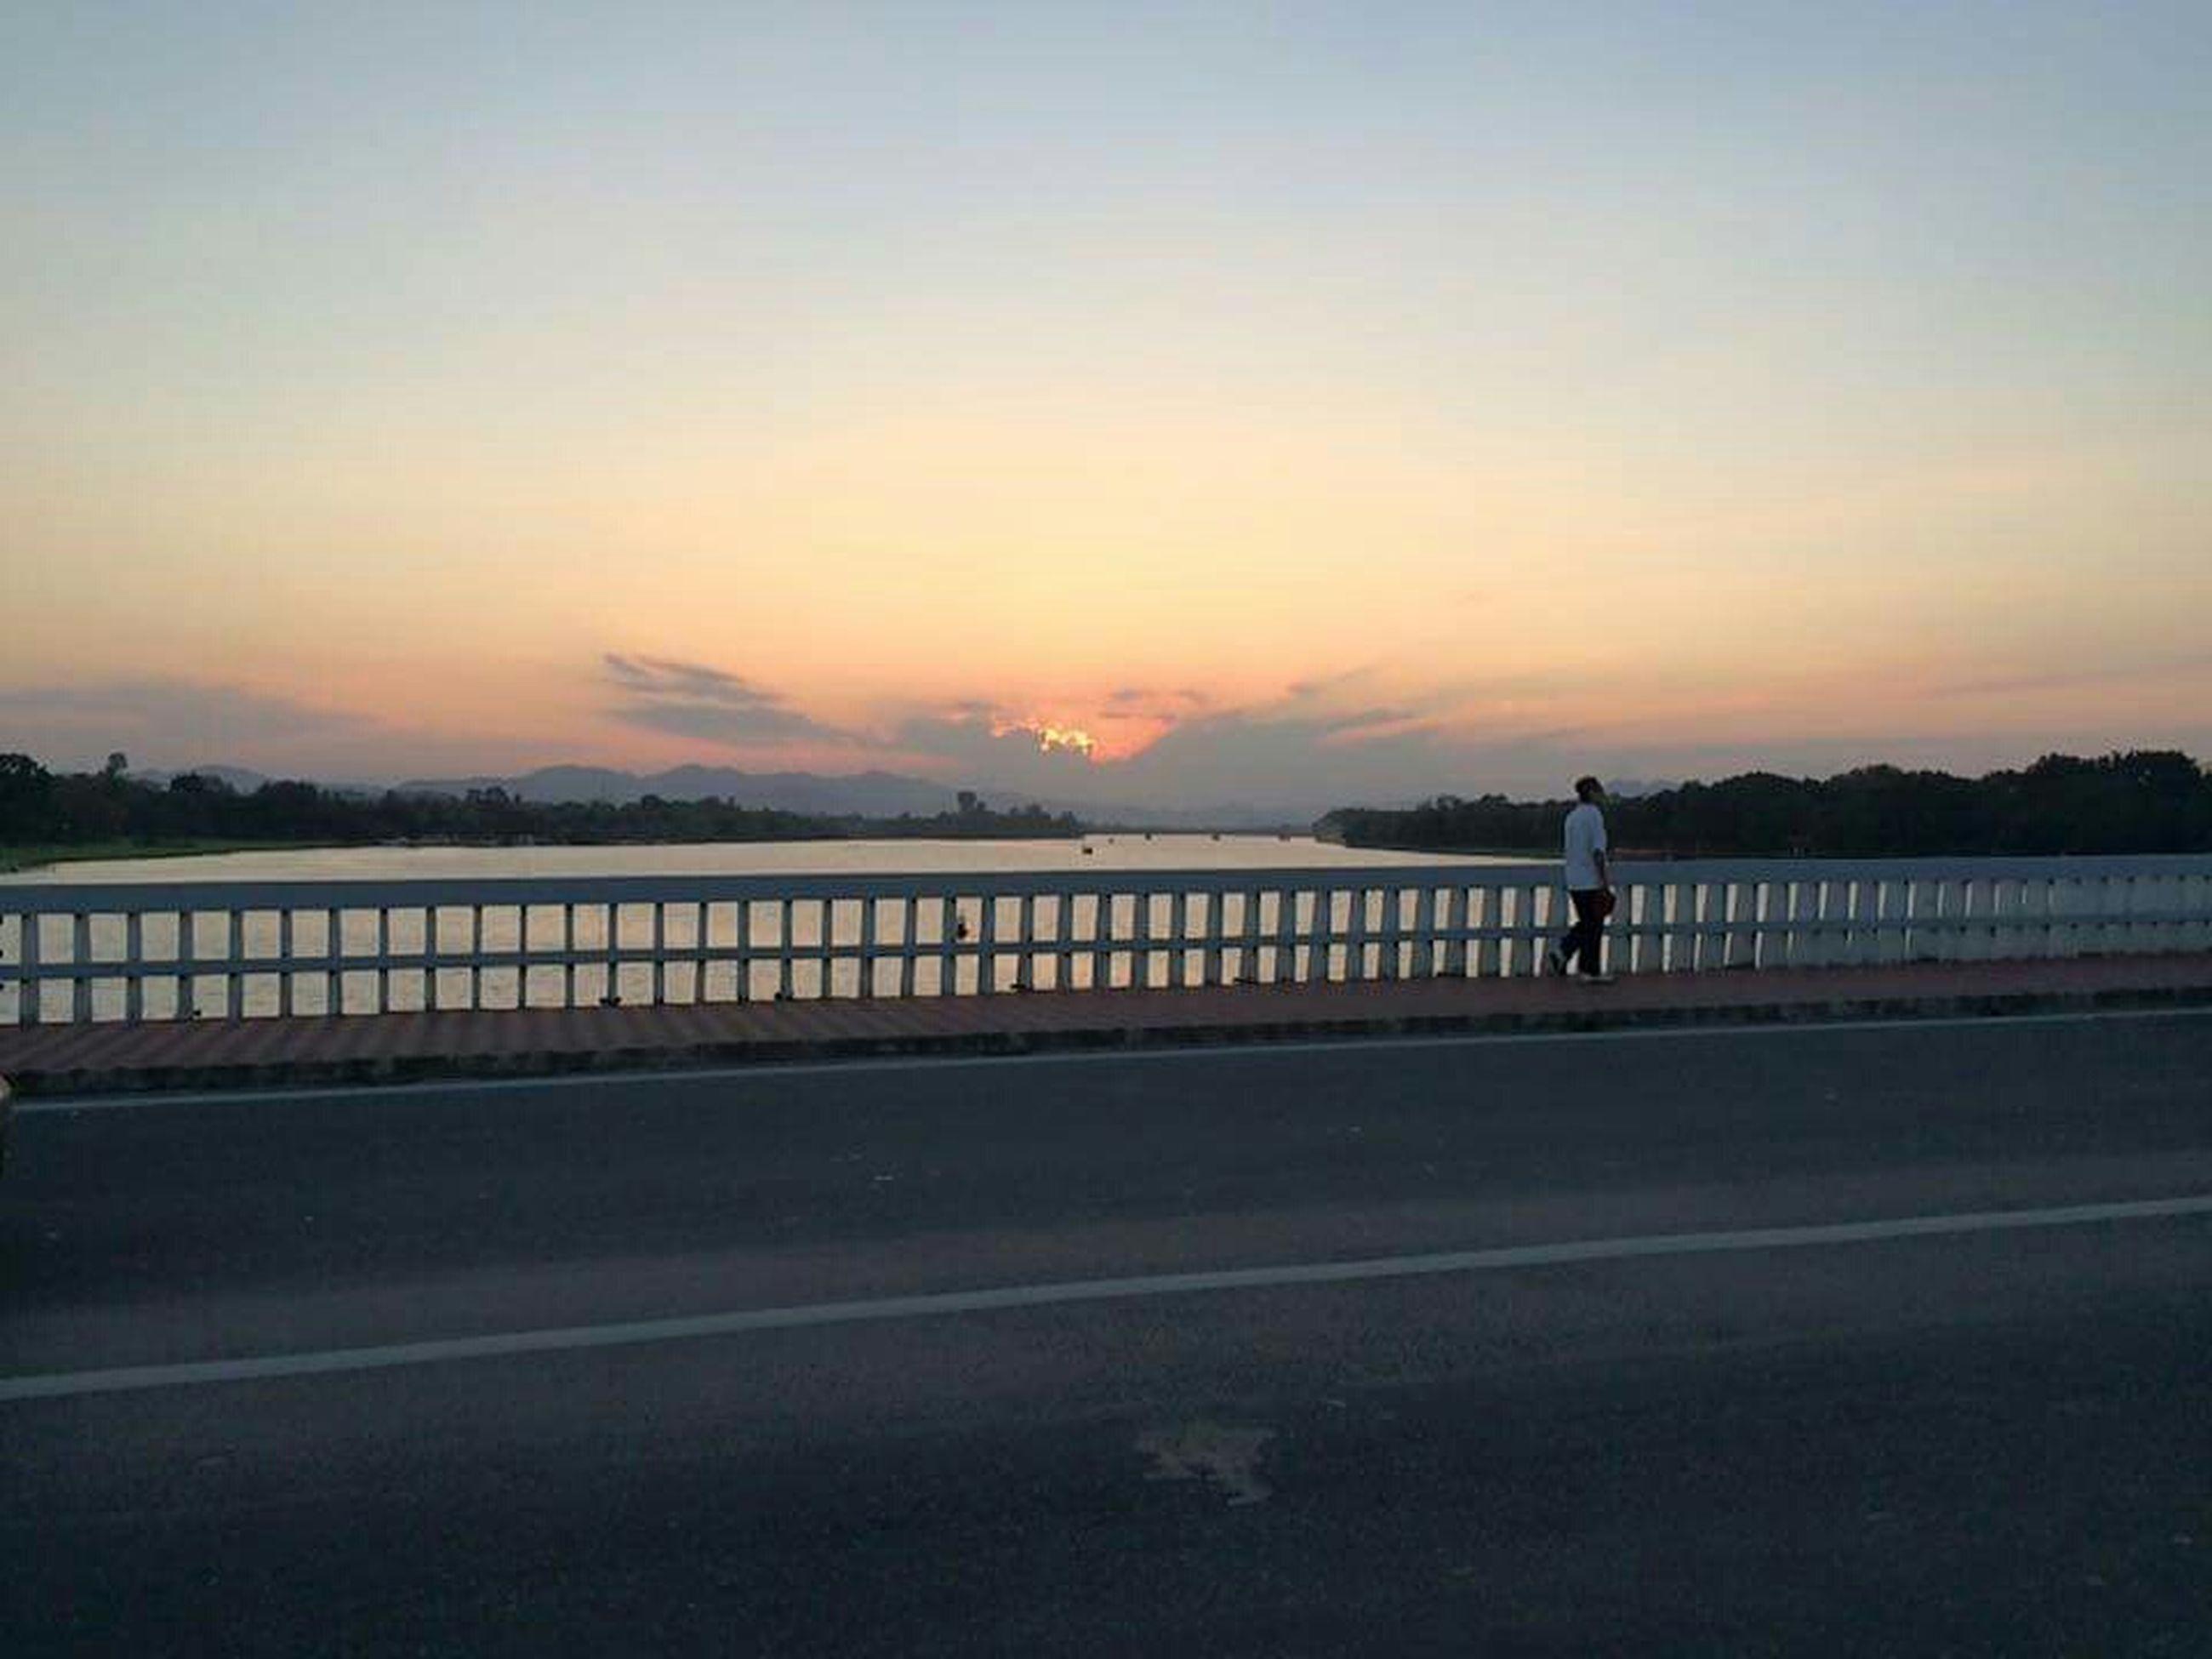 sunset, silhouette, lifestyles, men, leisure activity, sky, full length, road, walking, transportation, standing, rear view, orange color, dusk, street, nature, tranquil scene